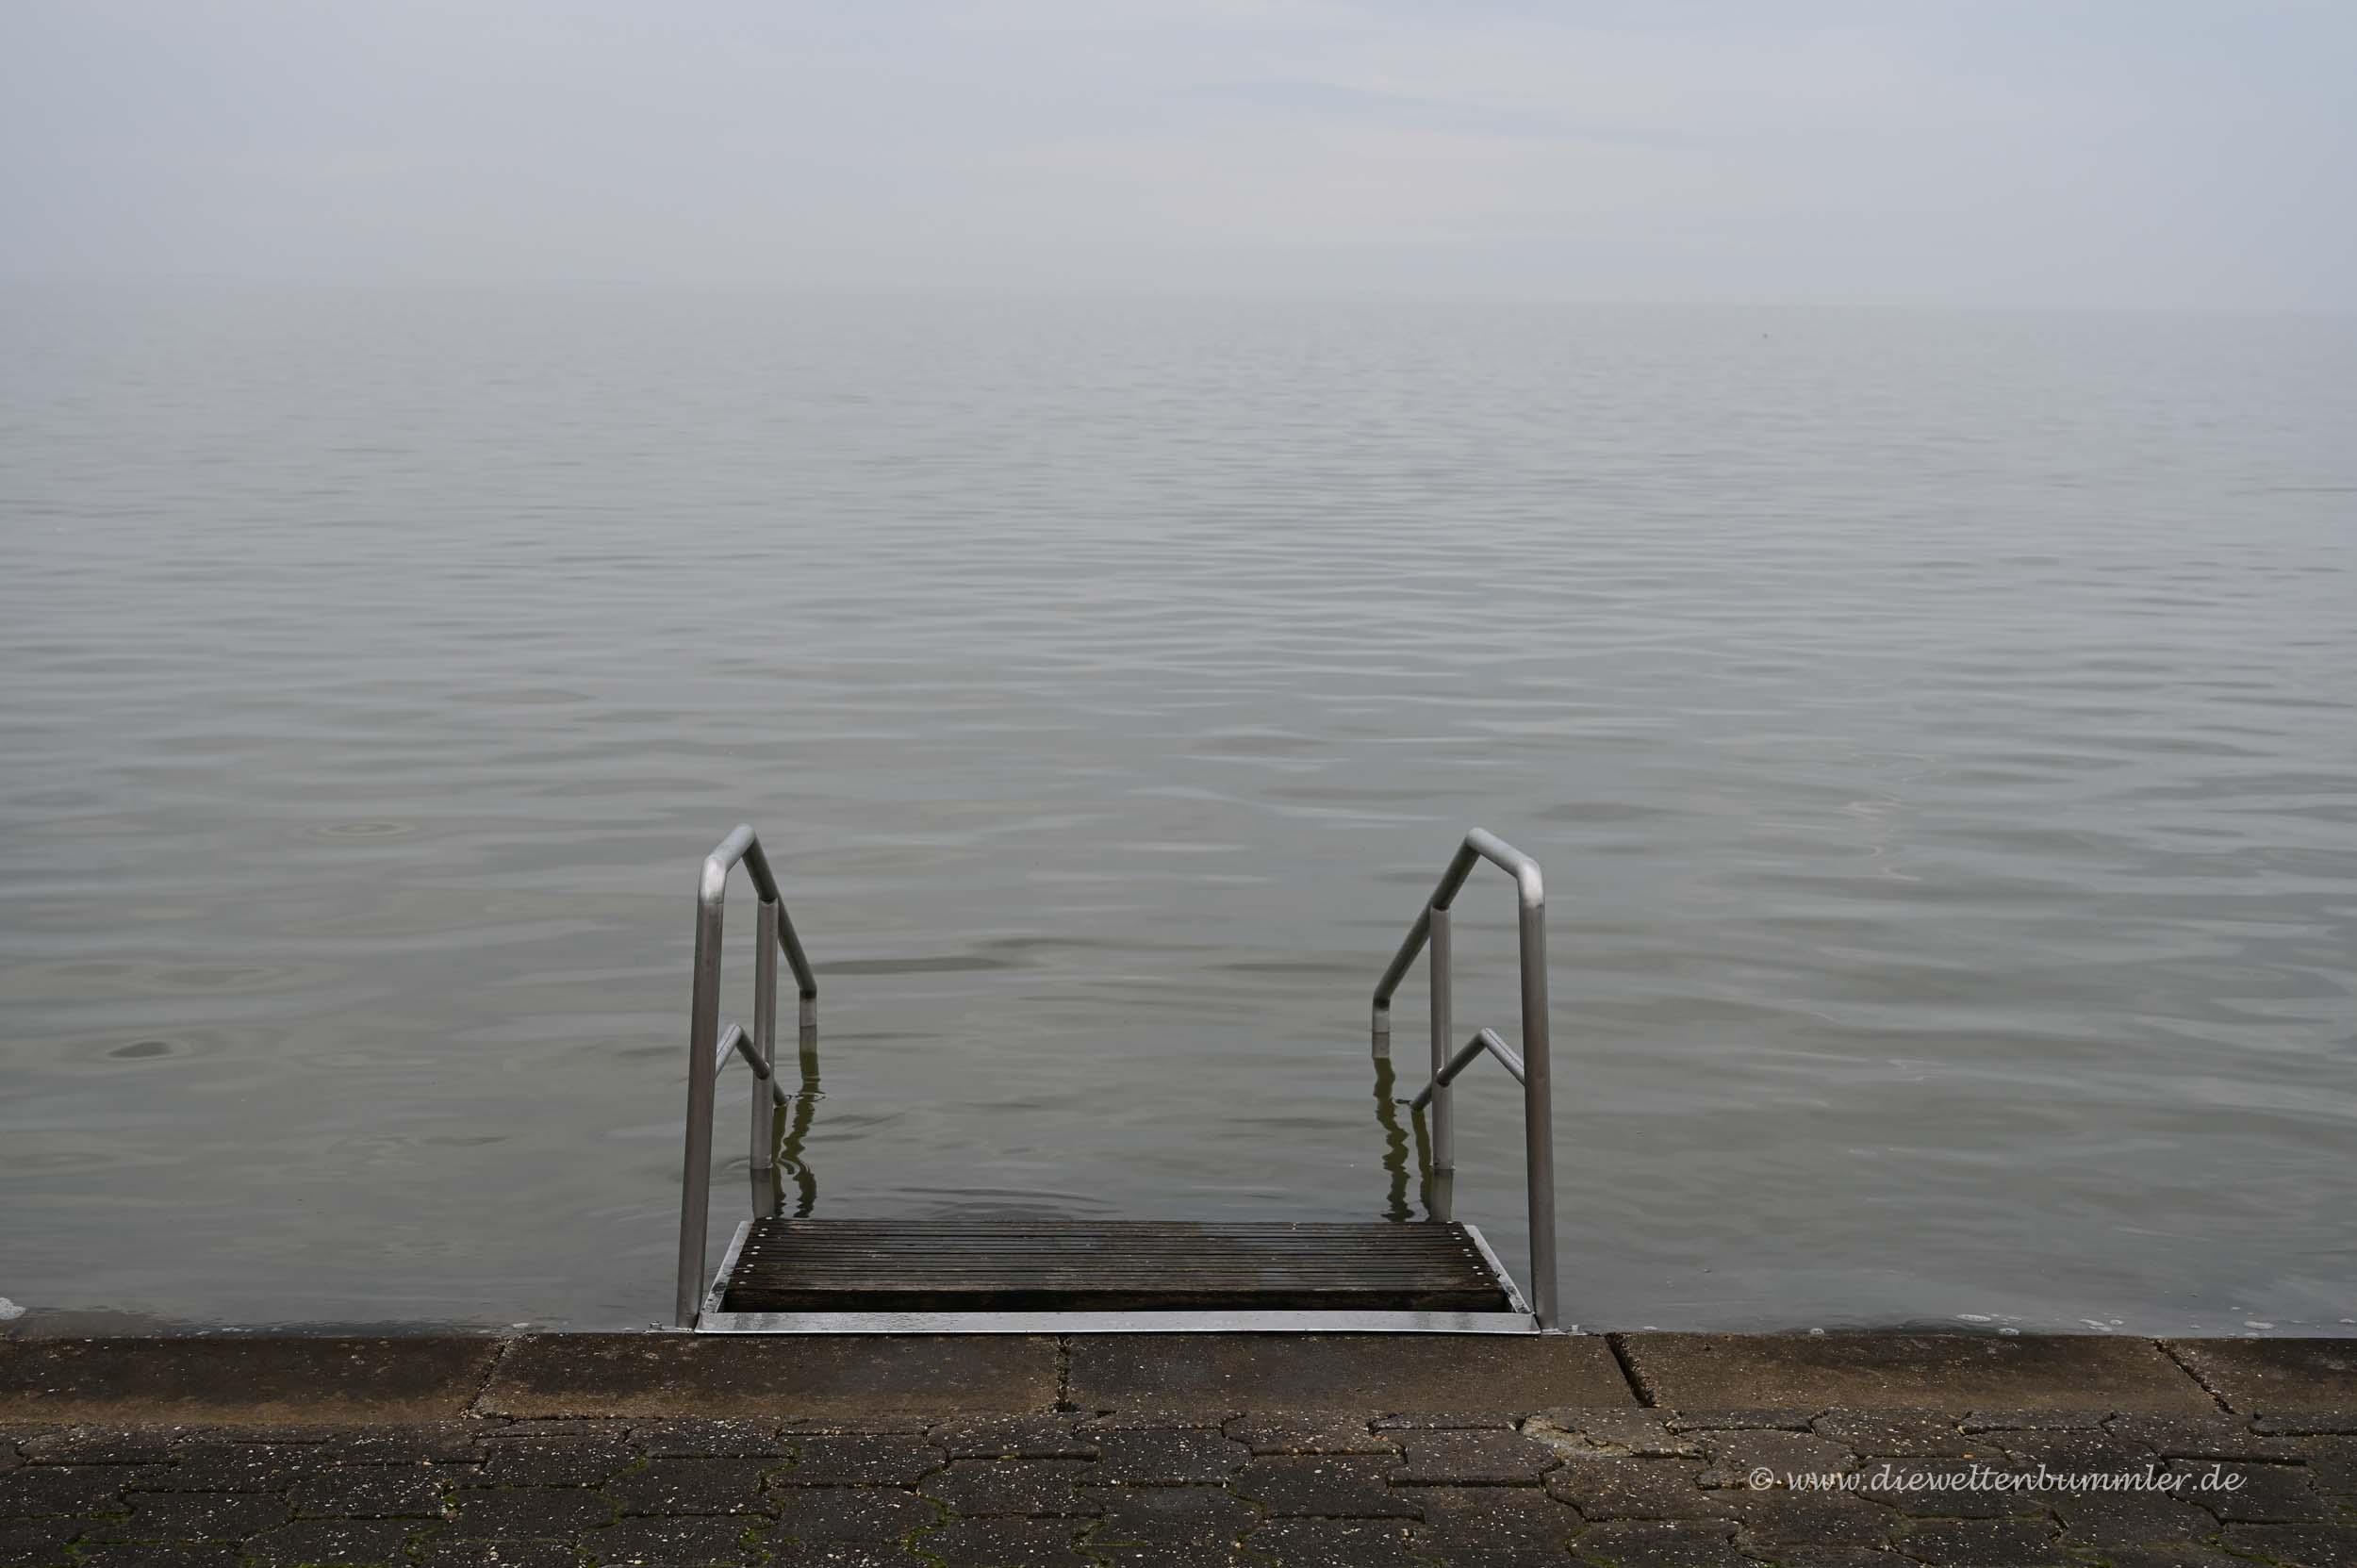 Sehr ruhige Nordsee